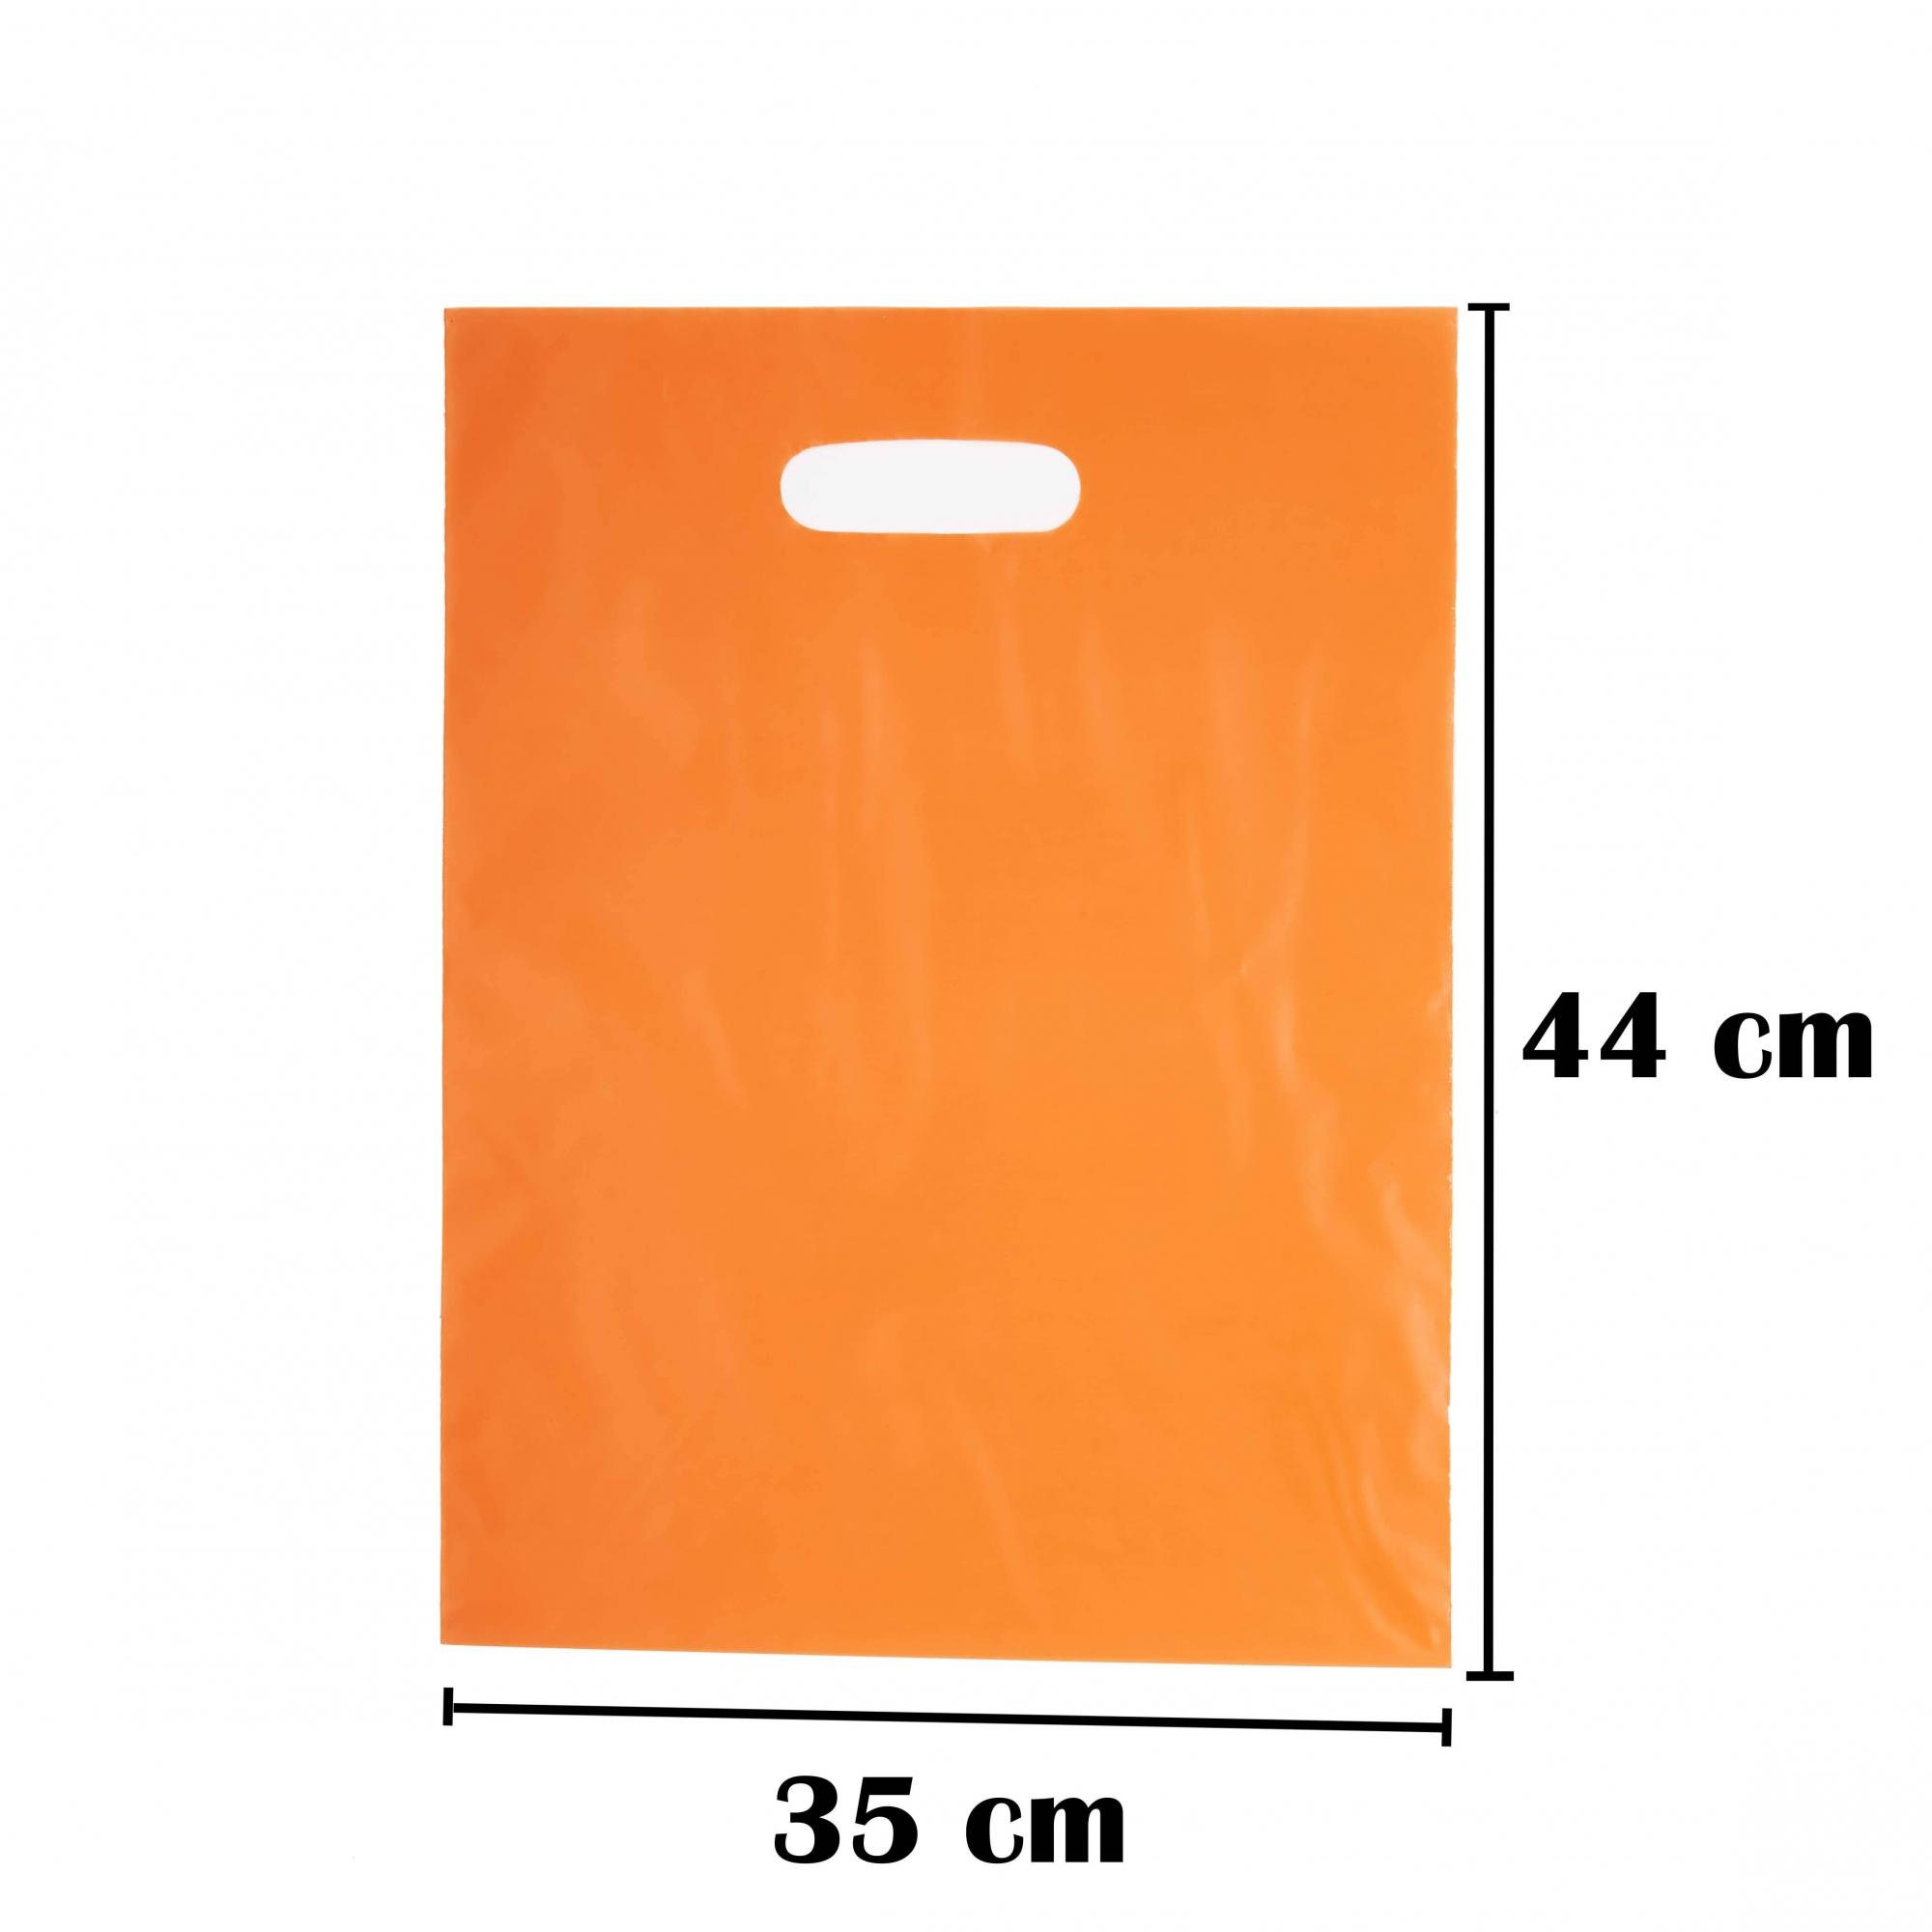 Sacola Plástica 35x44 Laranja Alça Boca de Palhaço 50 Unidades